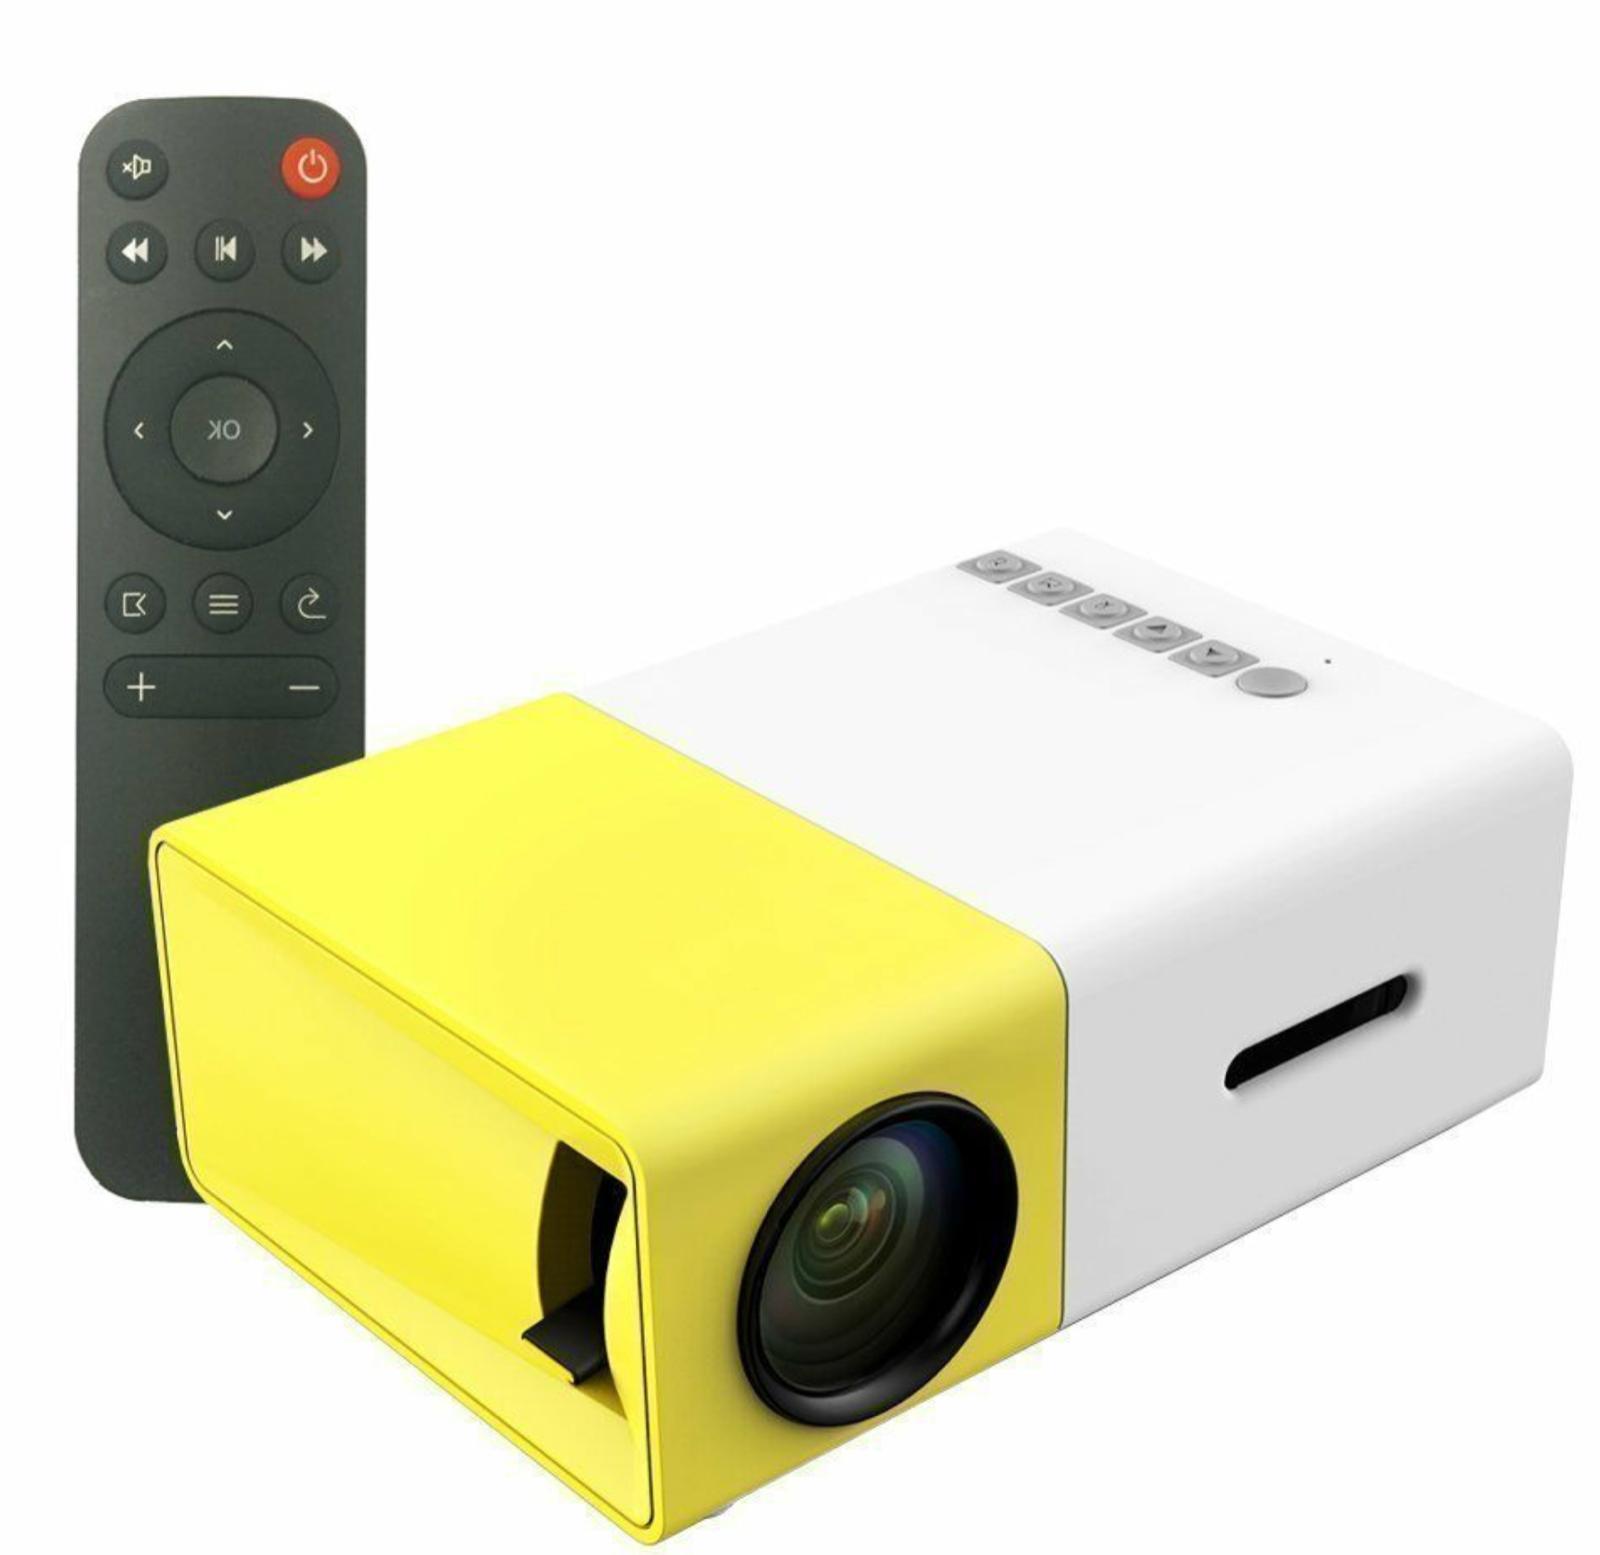 1080P Home USB HDMI YG300 SD LED